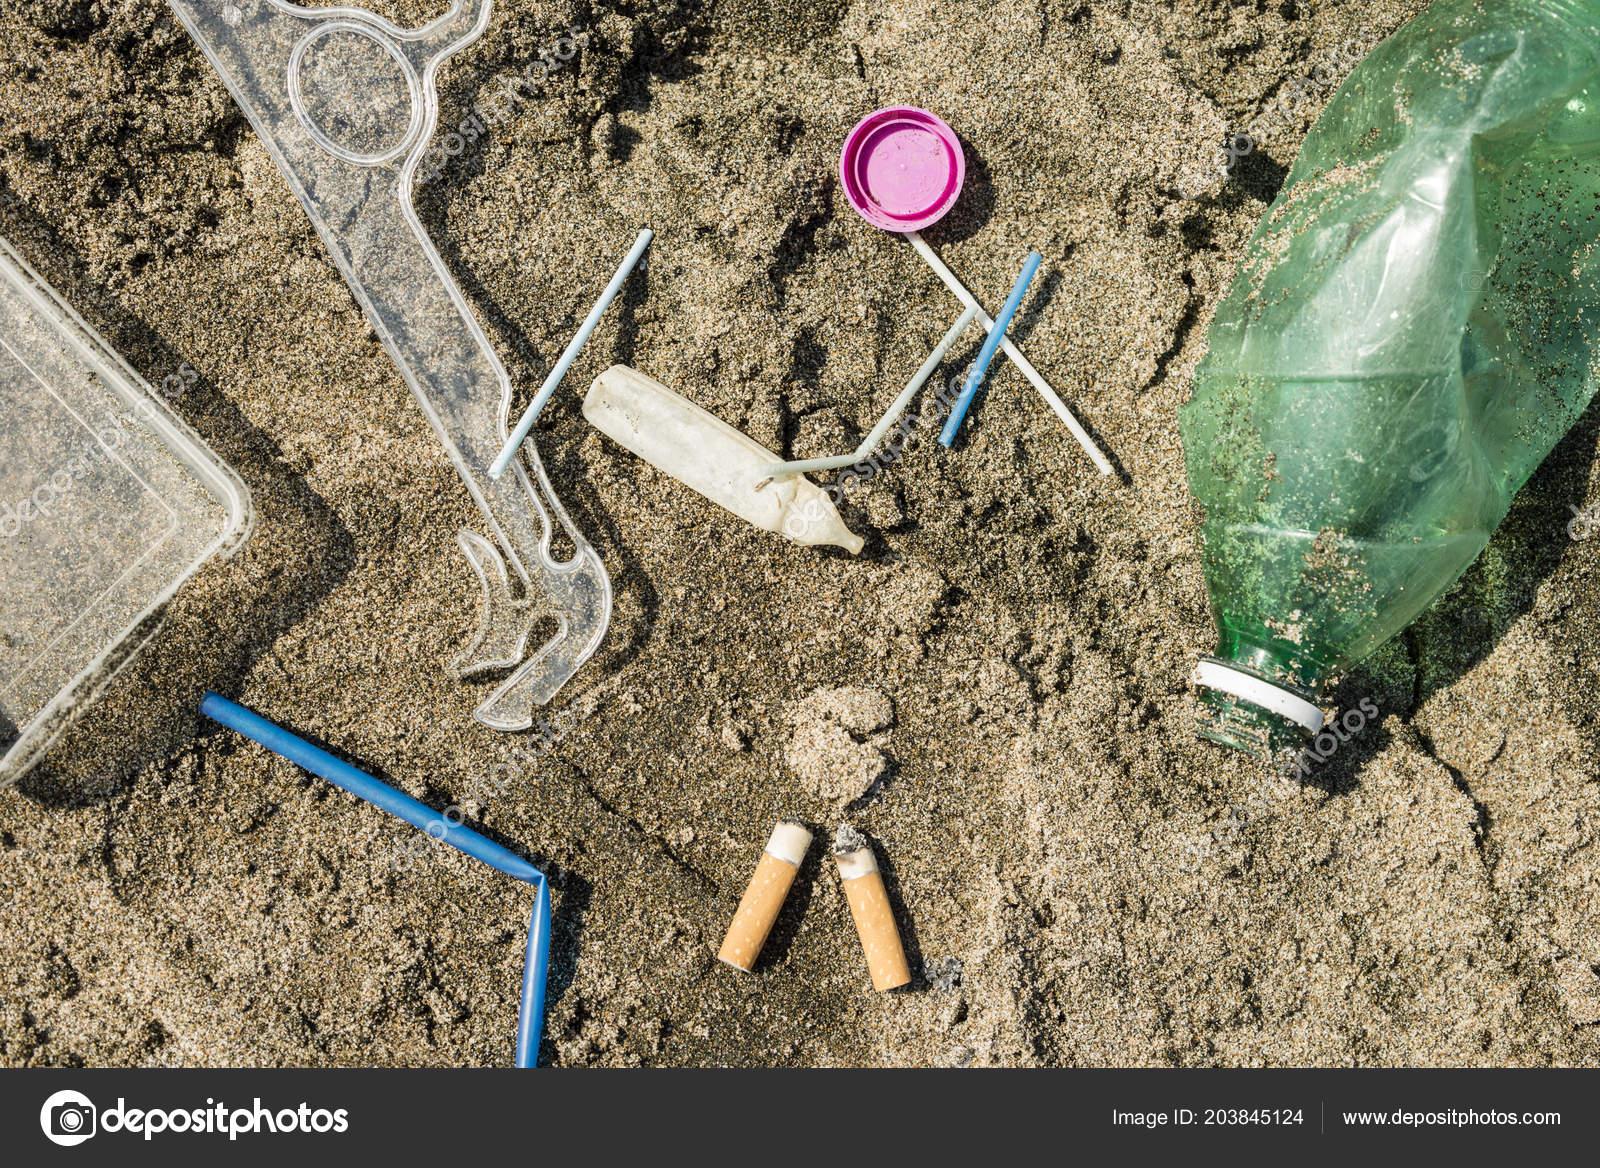 50fa23a8 Green Plastic Bottle Cotton Swabs Cap Box Cigarettes Left Sandy — Stock  Photo